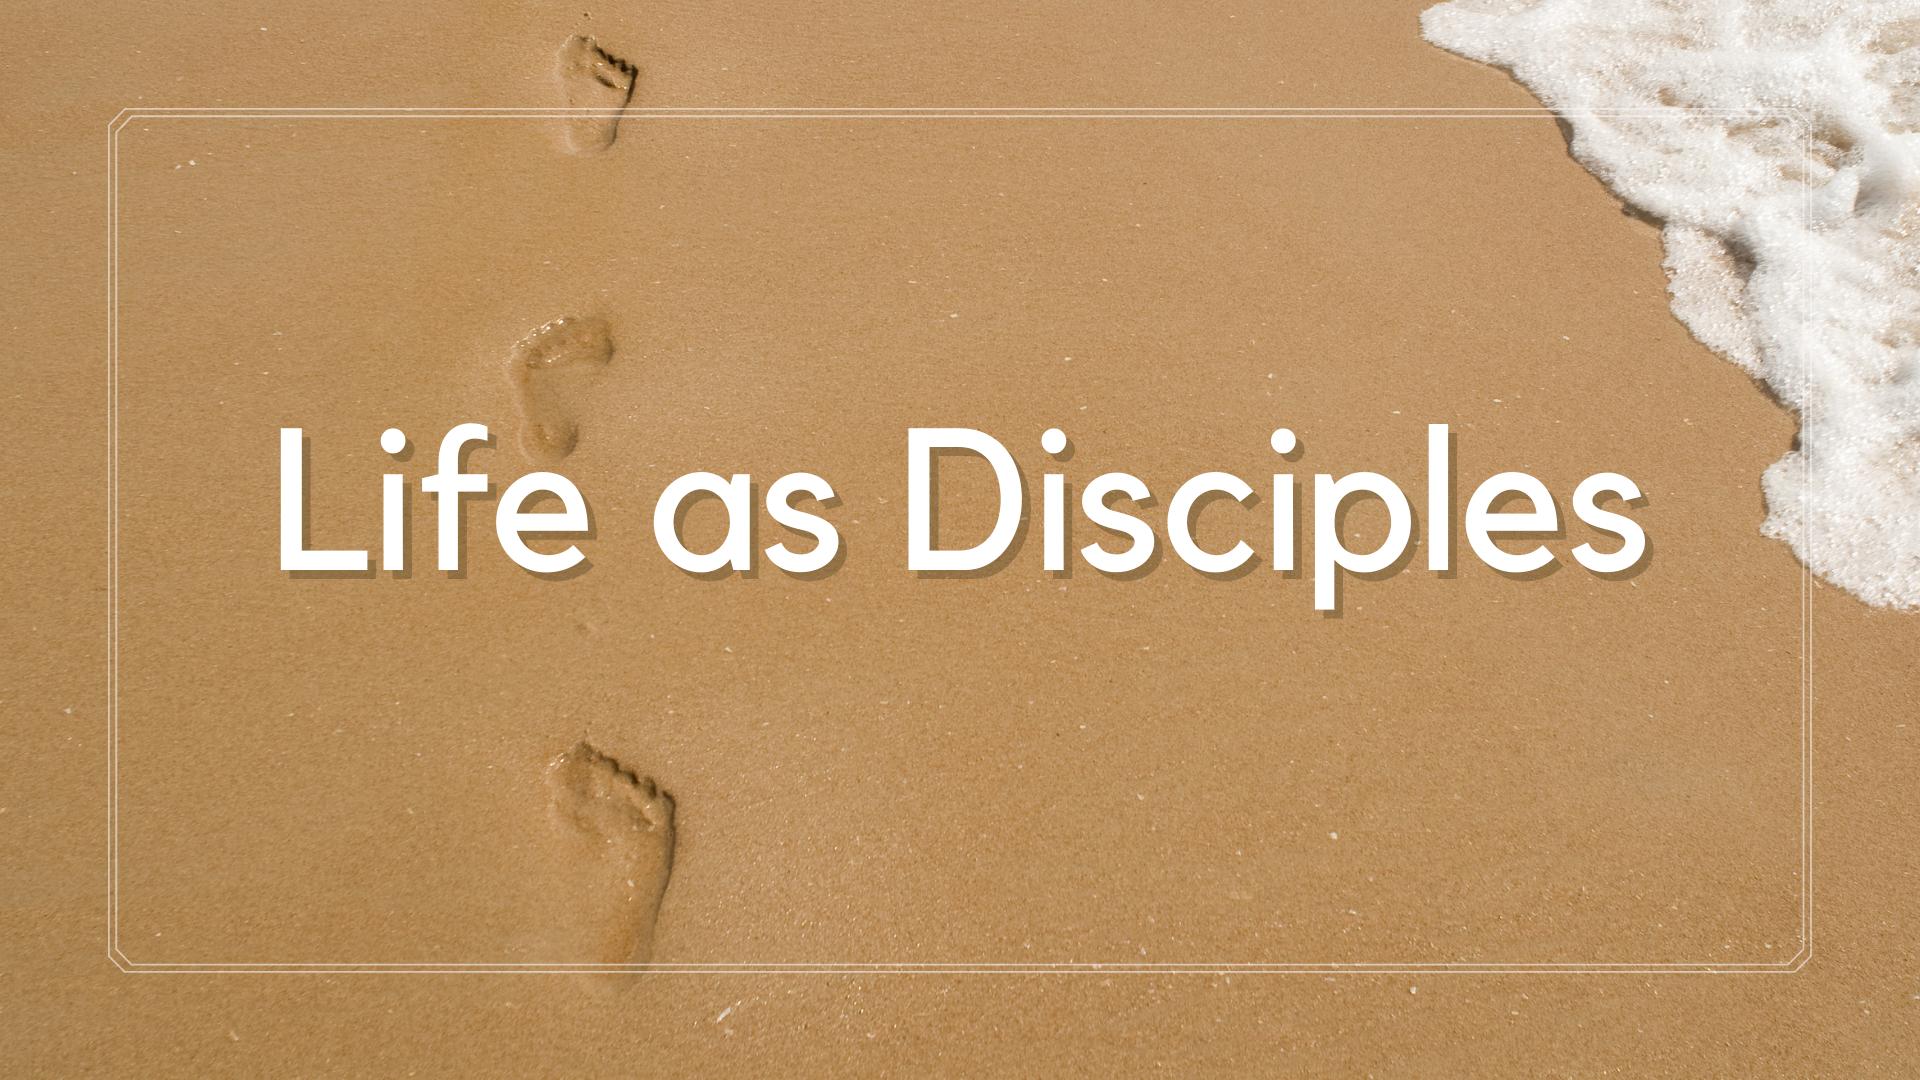 Life as Disciples